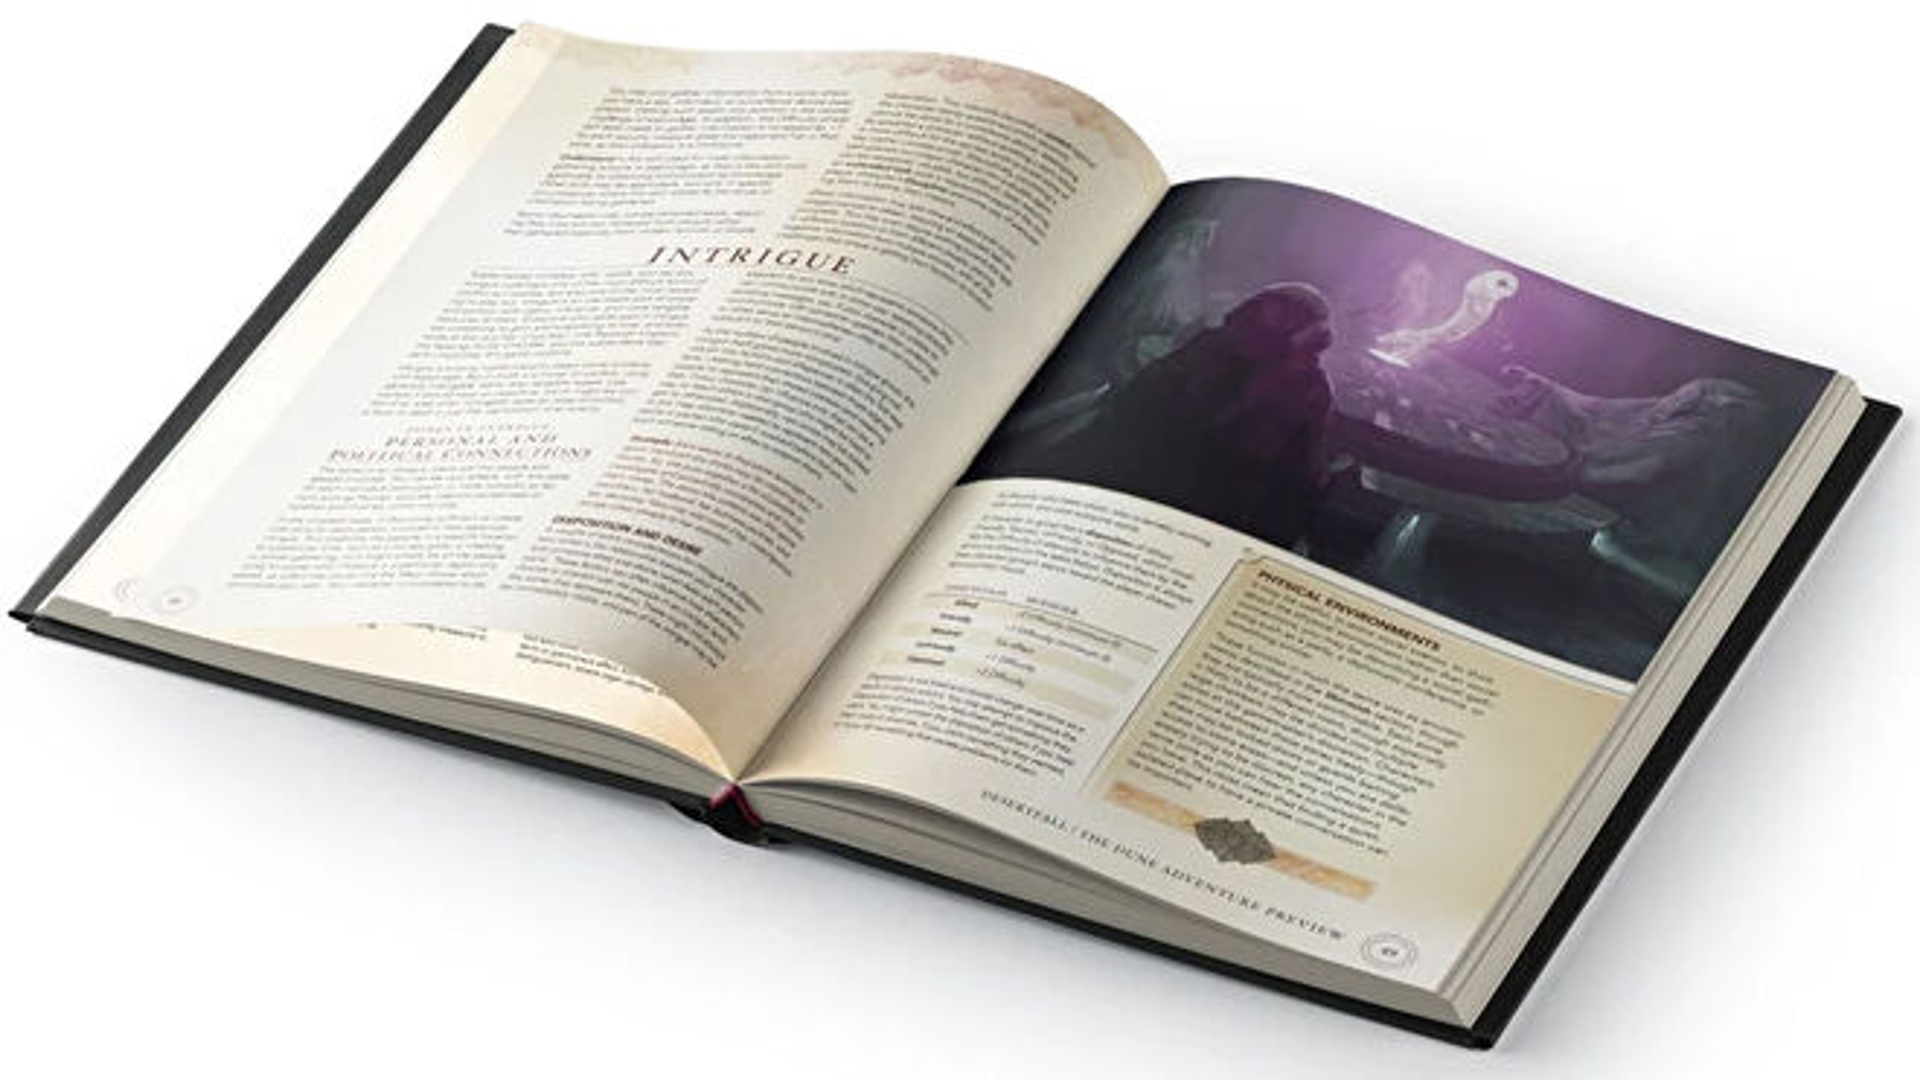 dune-rpg-adventures-in-the-imperium-rulebook-open-spread.jpg